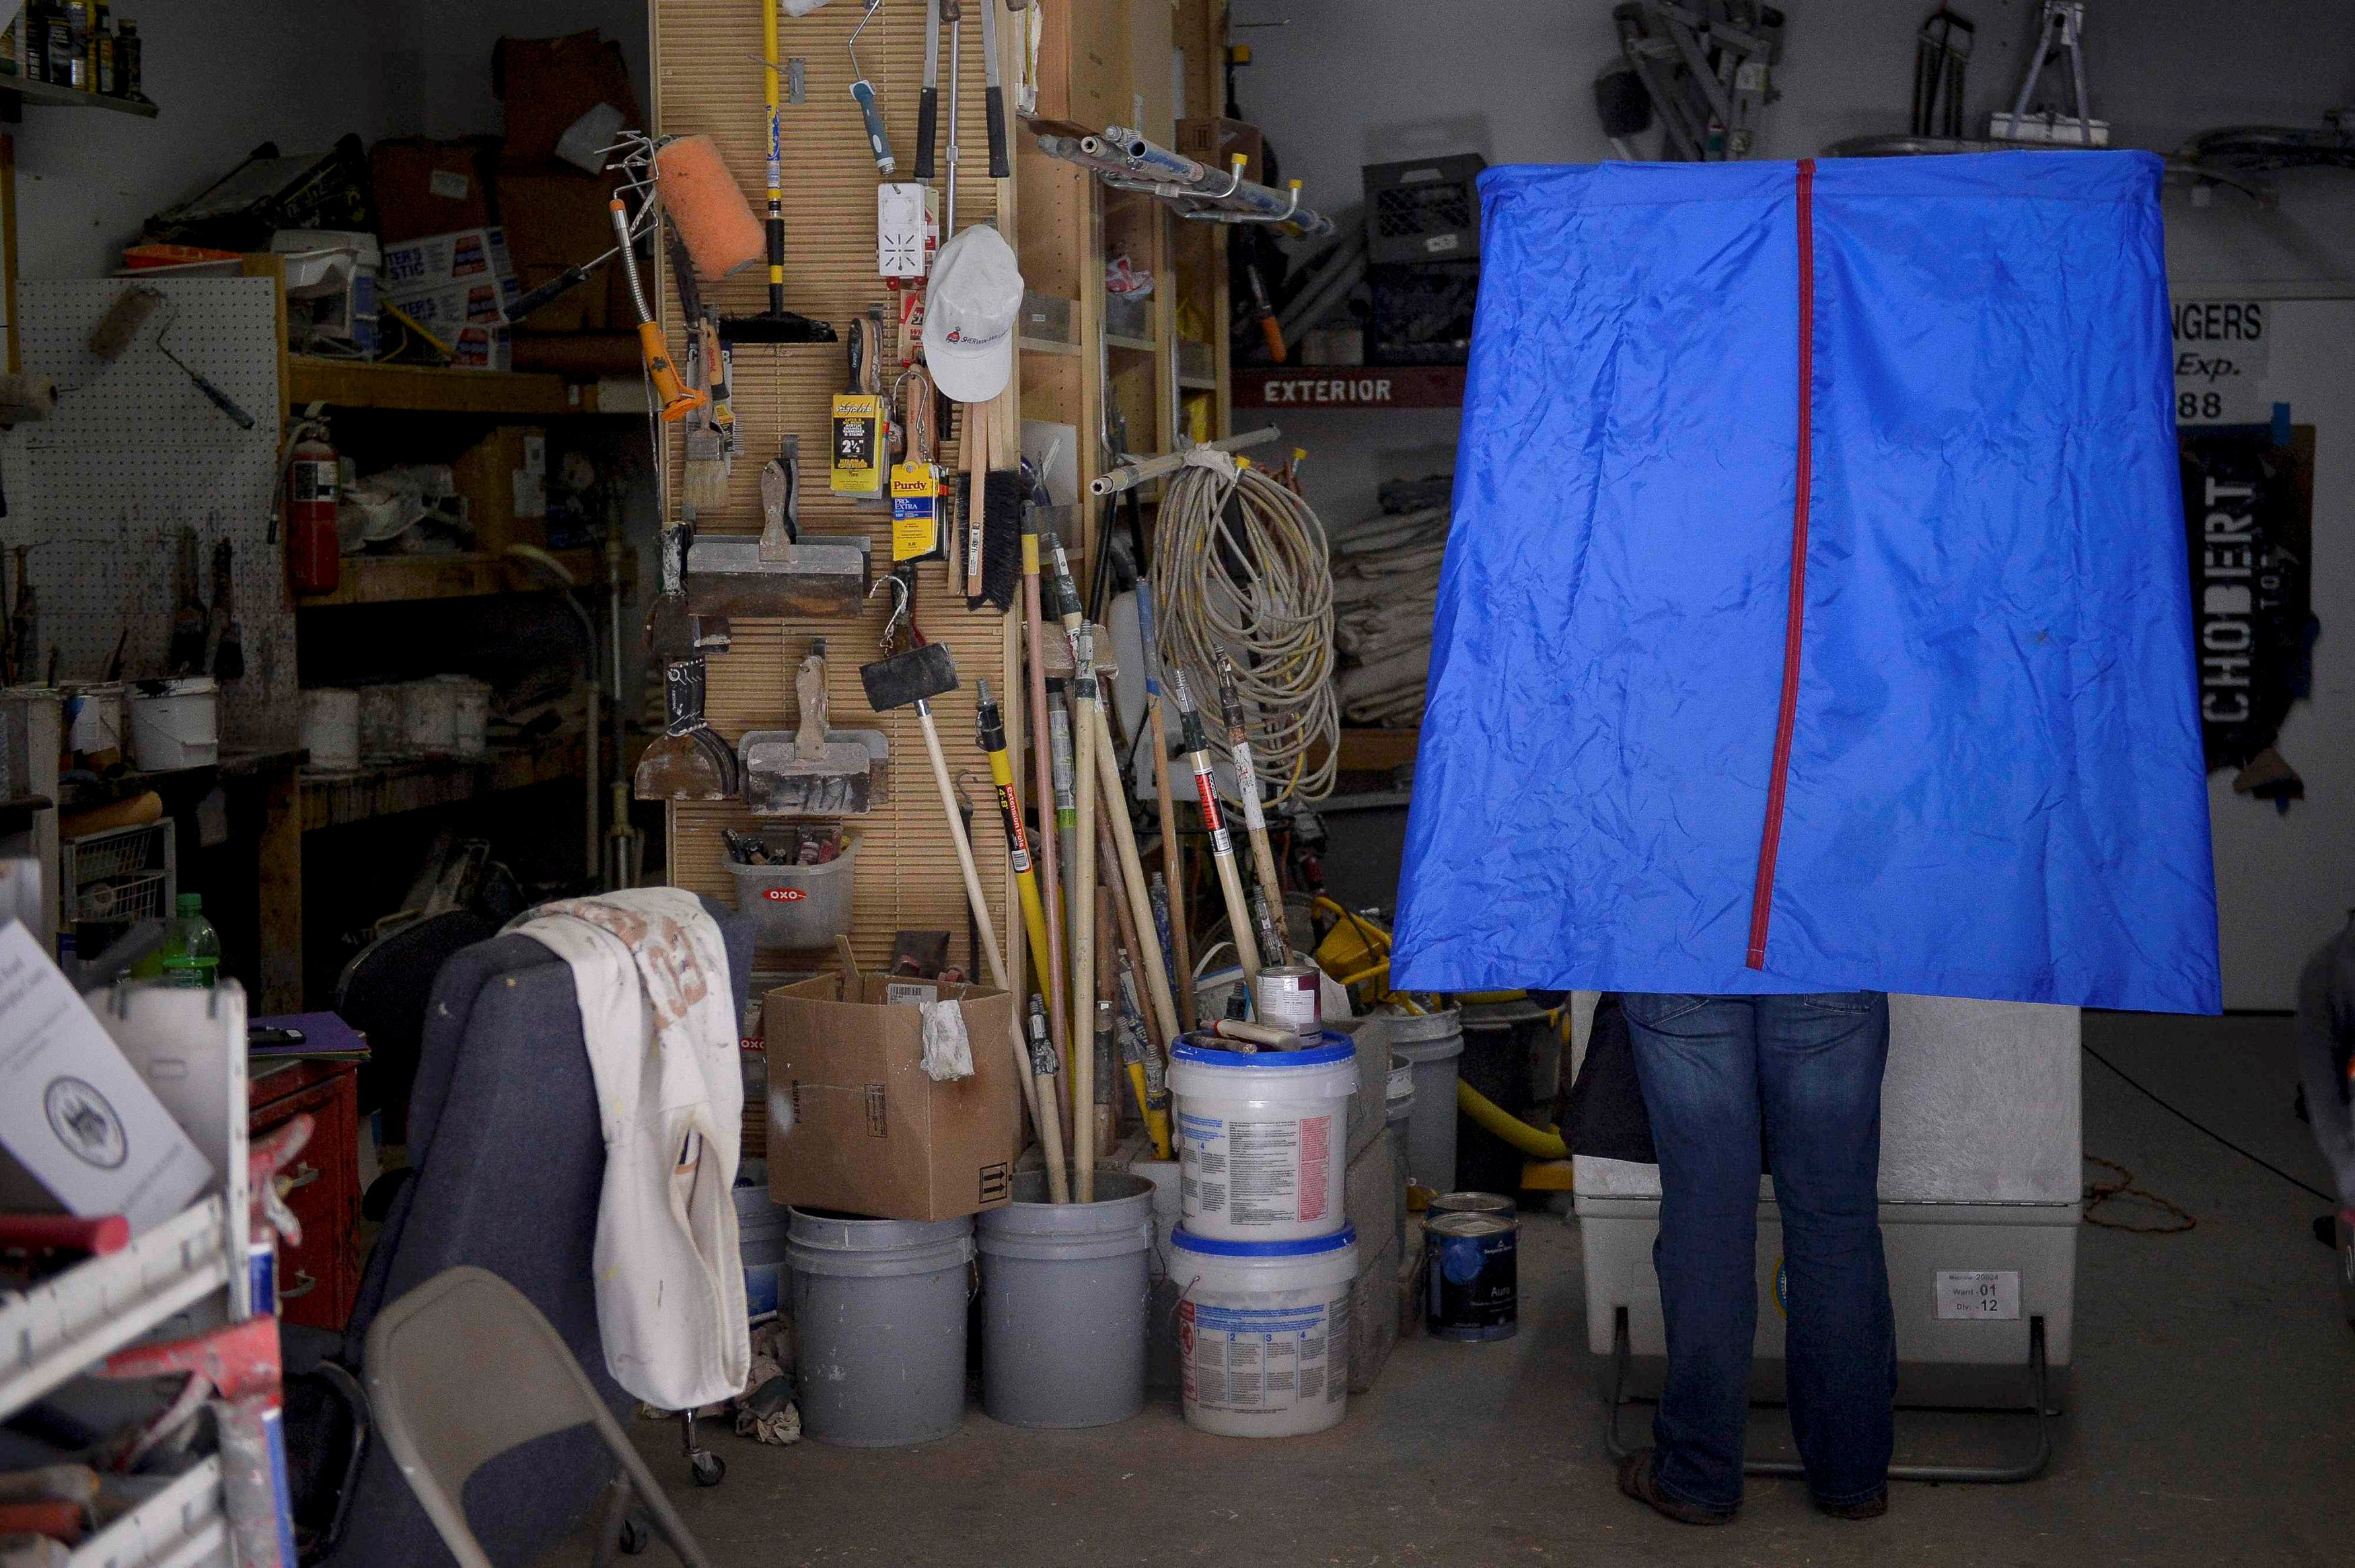 A voter casts his ballot inside the garage of Chobert Decorators in Philadelphia.